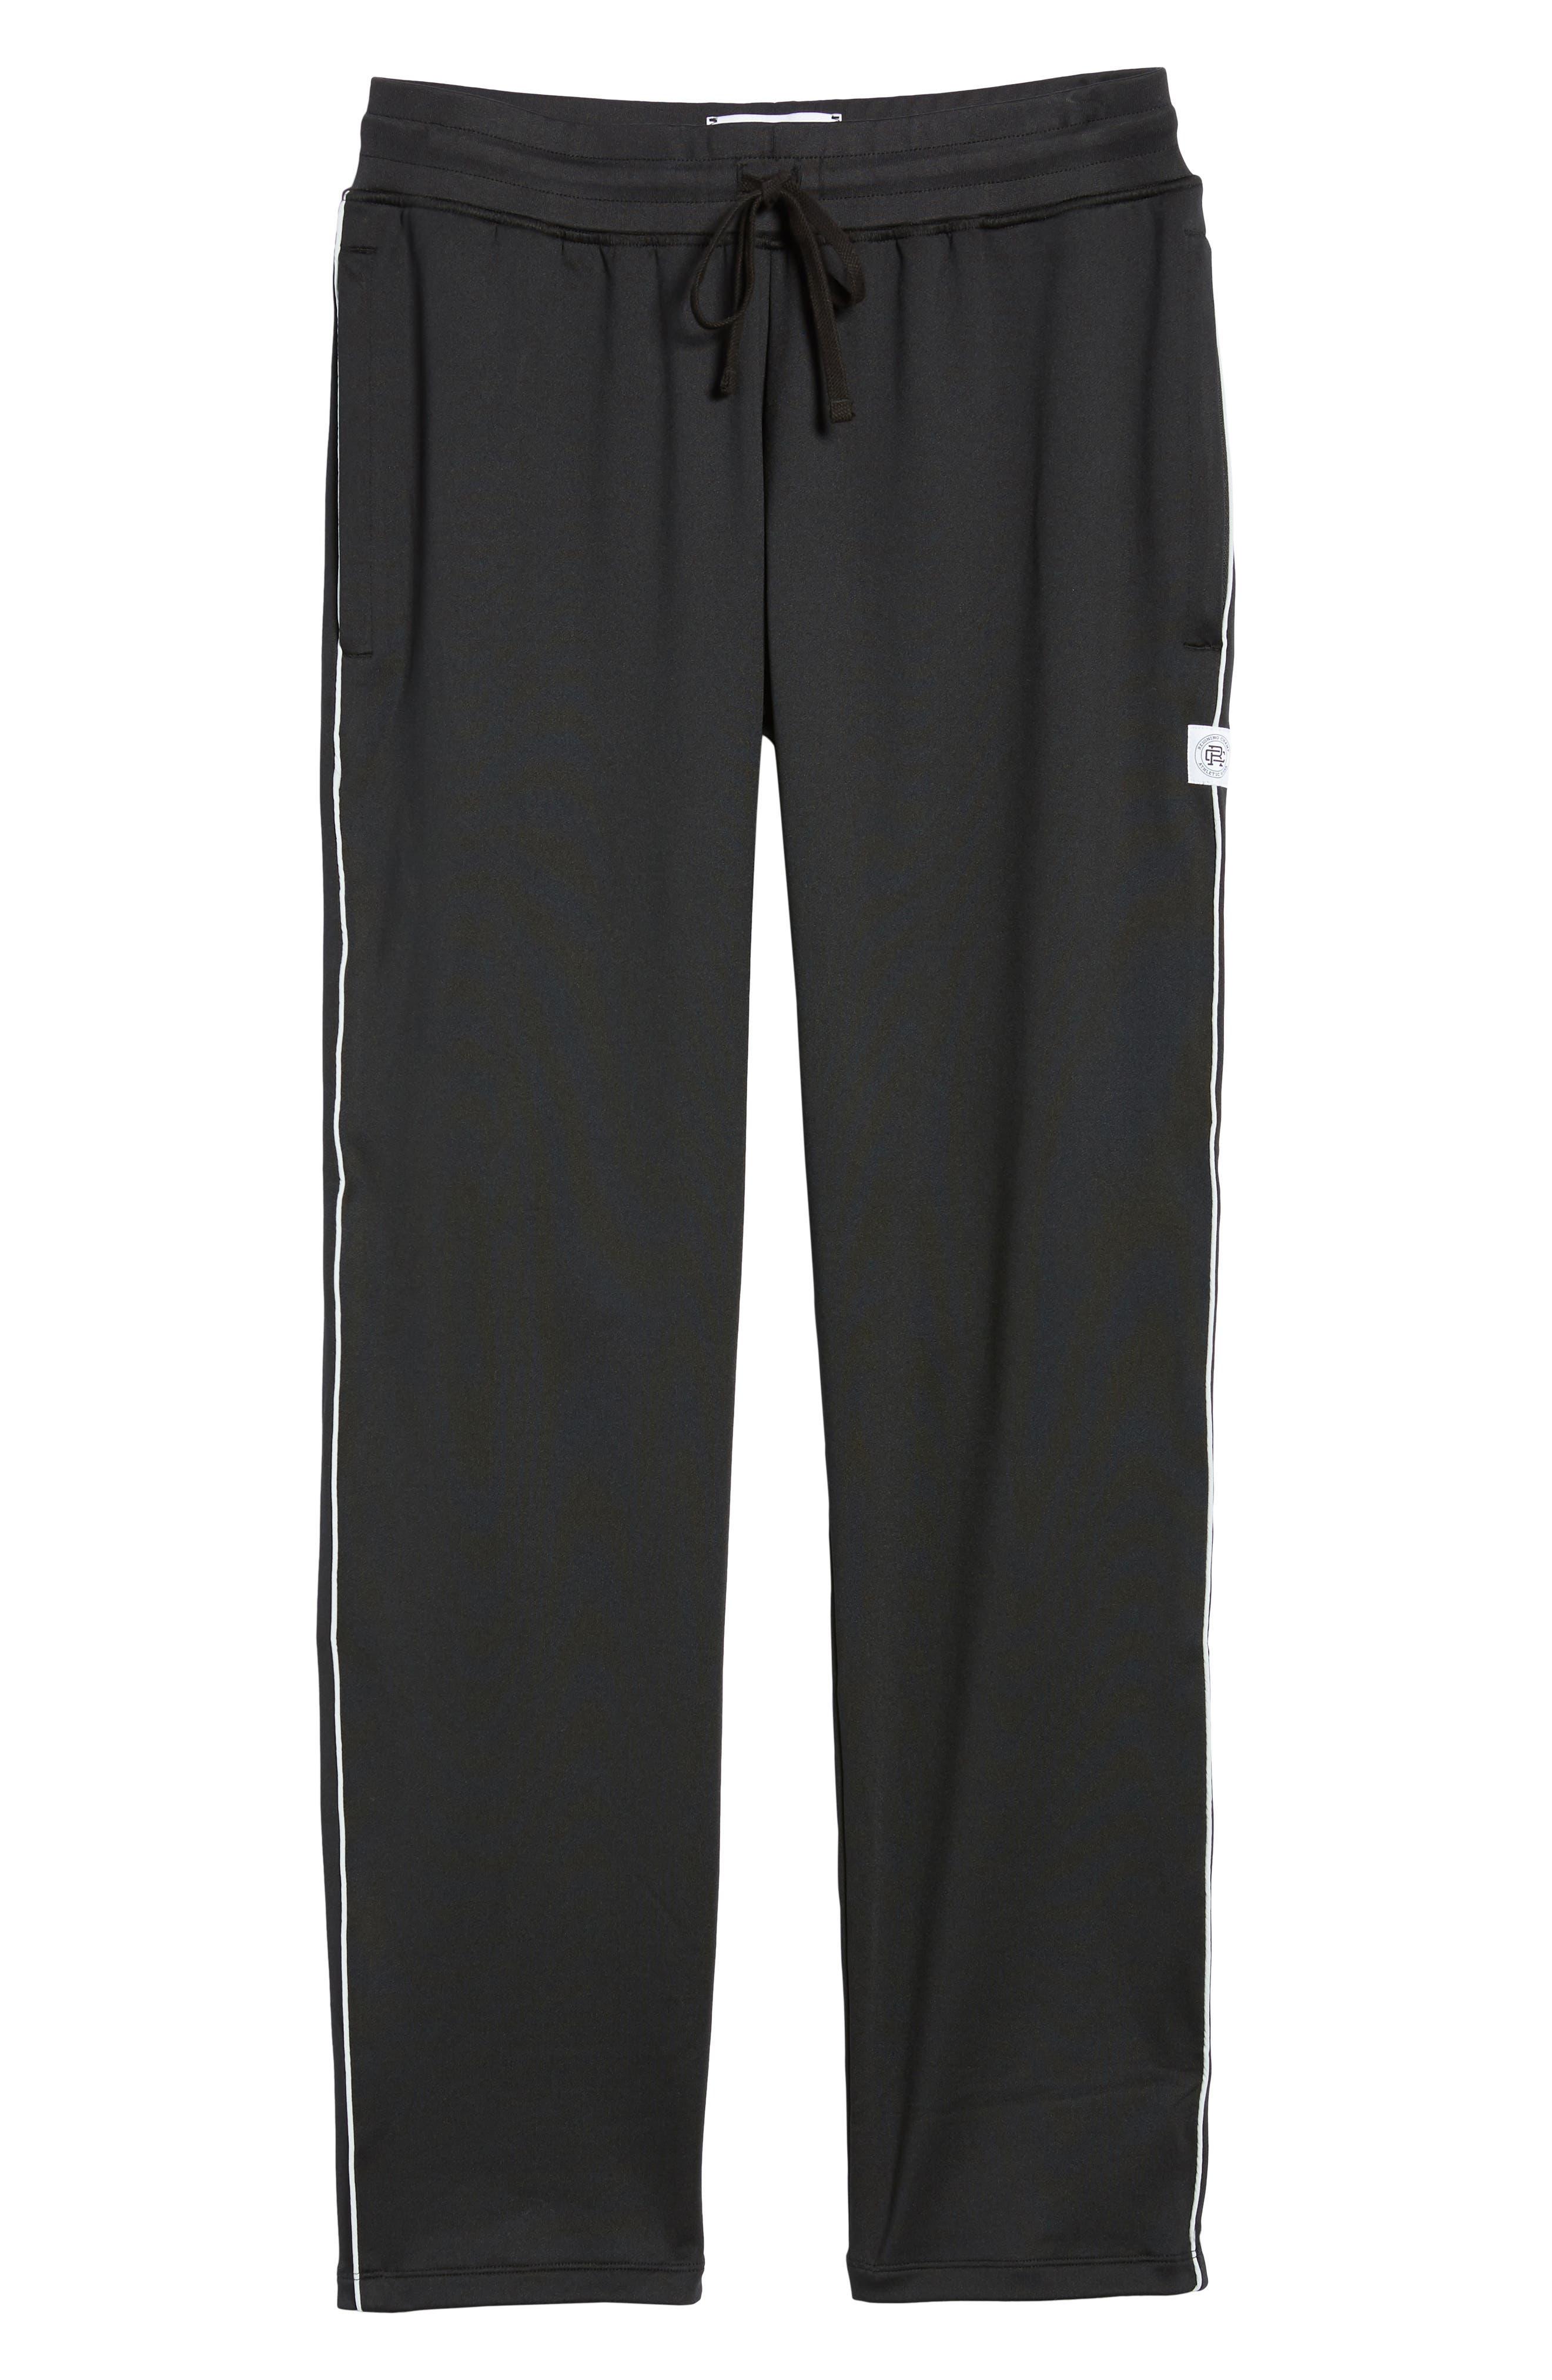 CoolMax<sup>®</sup> Track Pants,                             Alternate thumbnail 6, color,